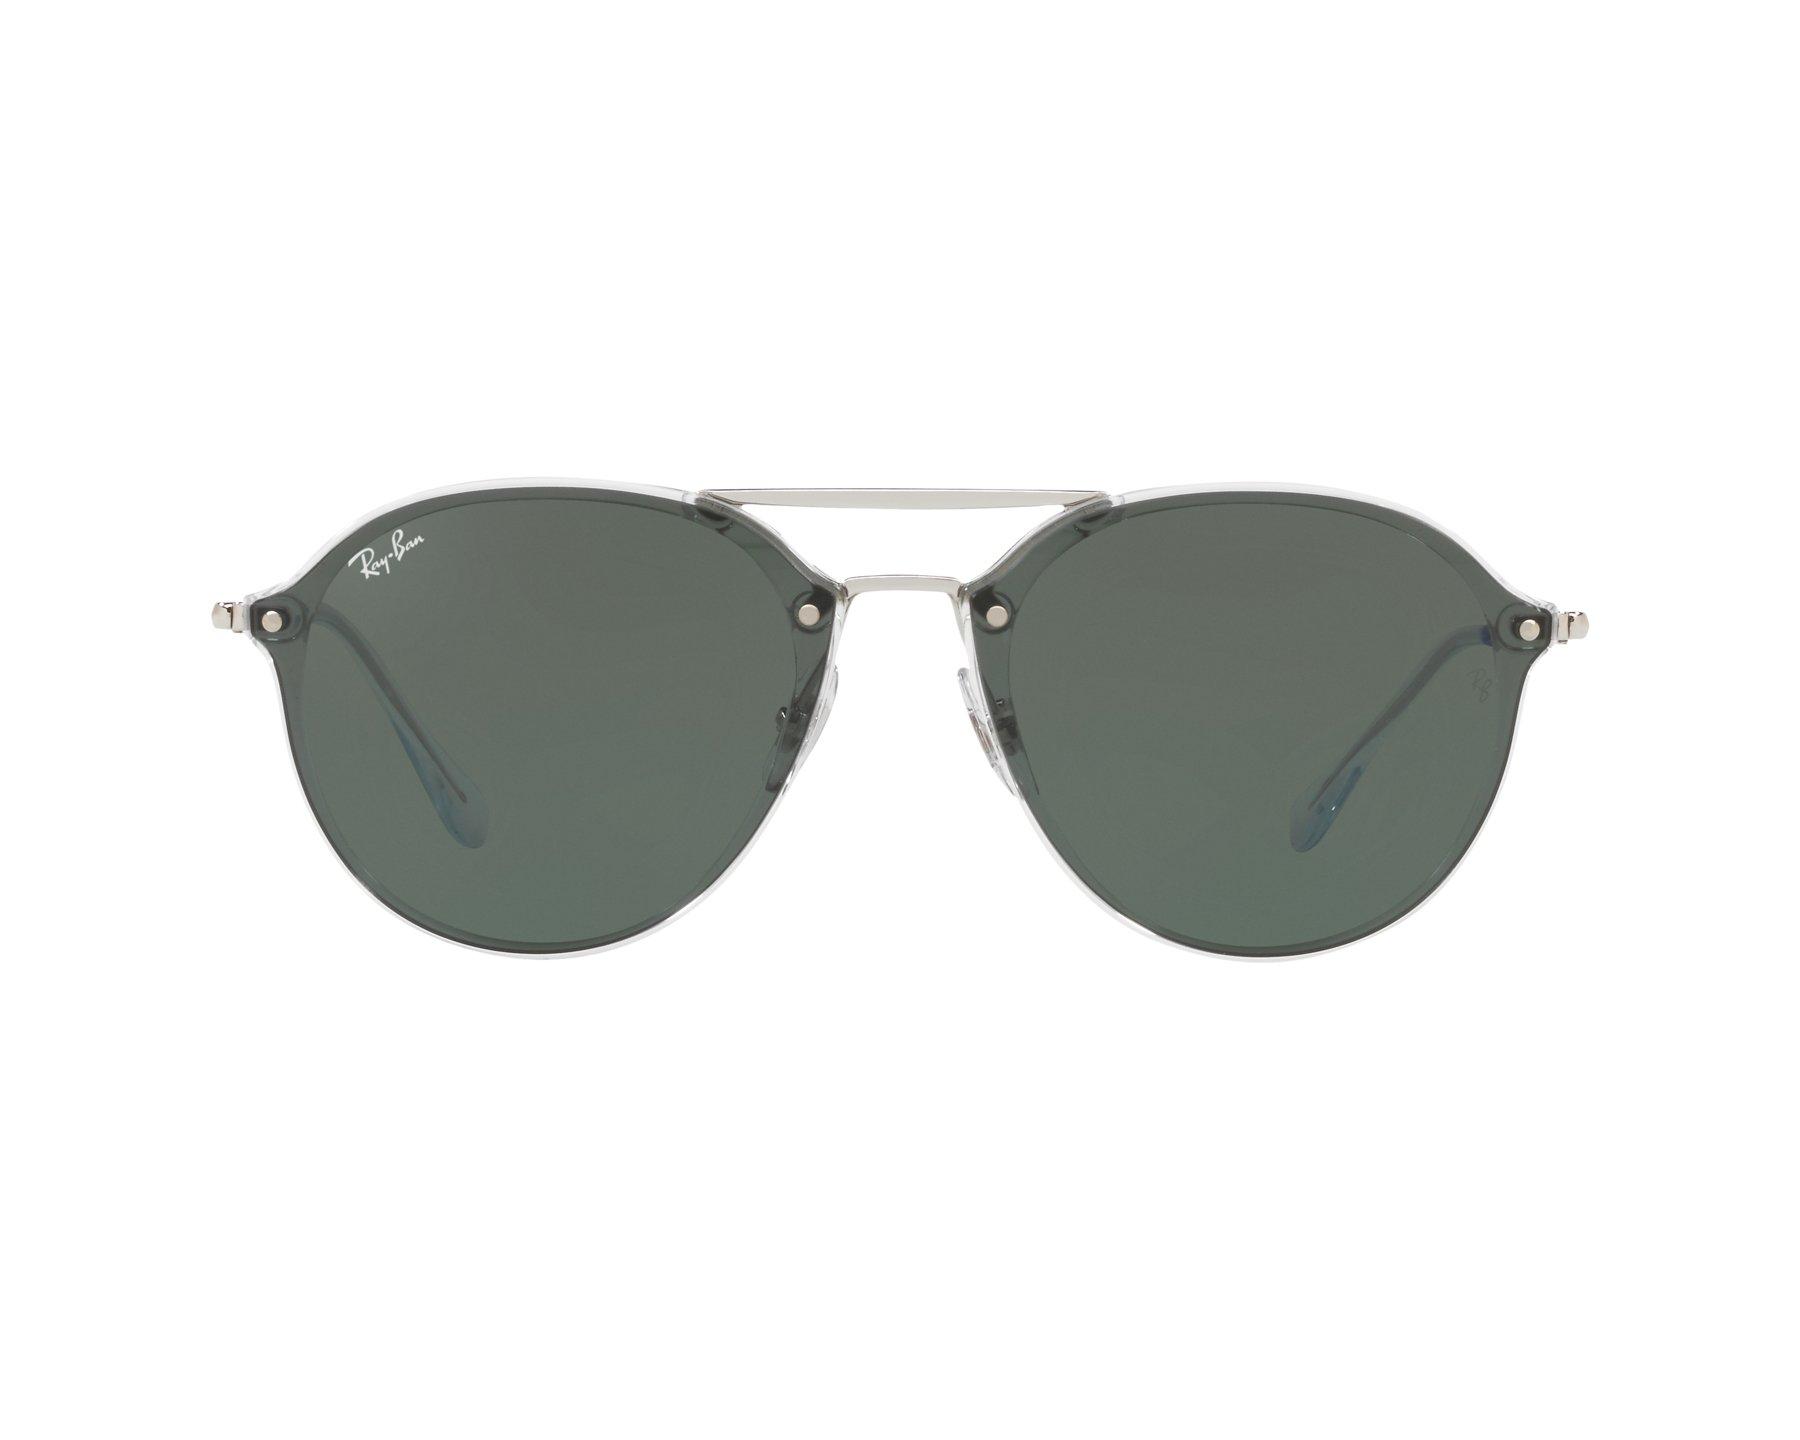 2280167c1df Sunglasses Ray-Ban RB-4292-N 632571 62-14 Silver Crystal 360